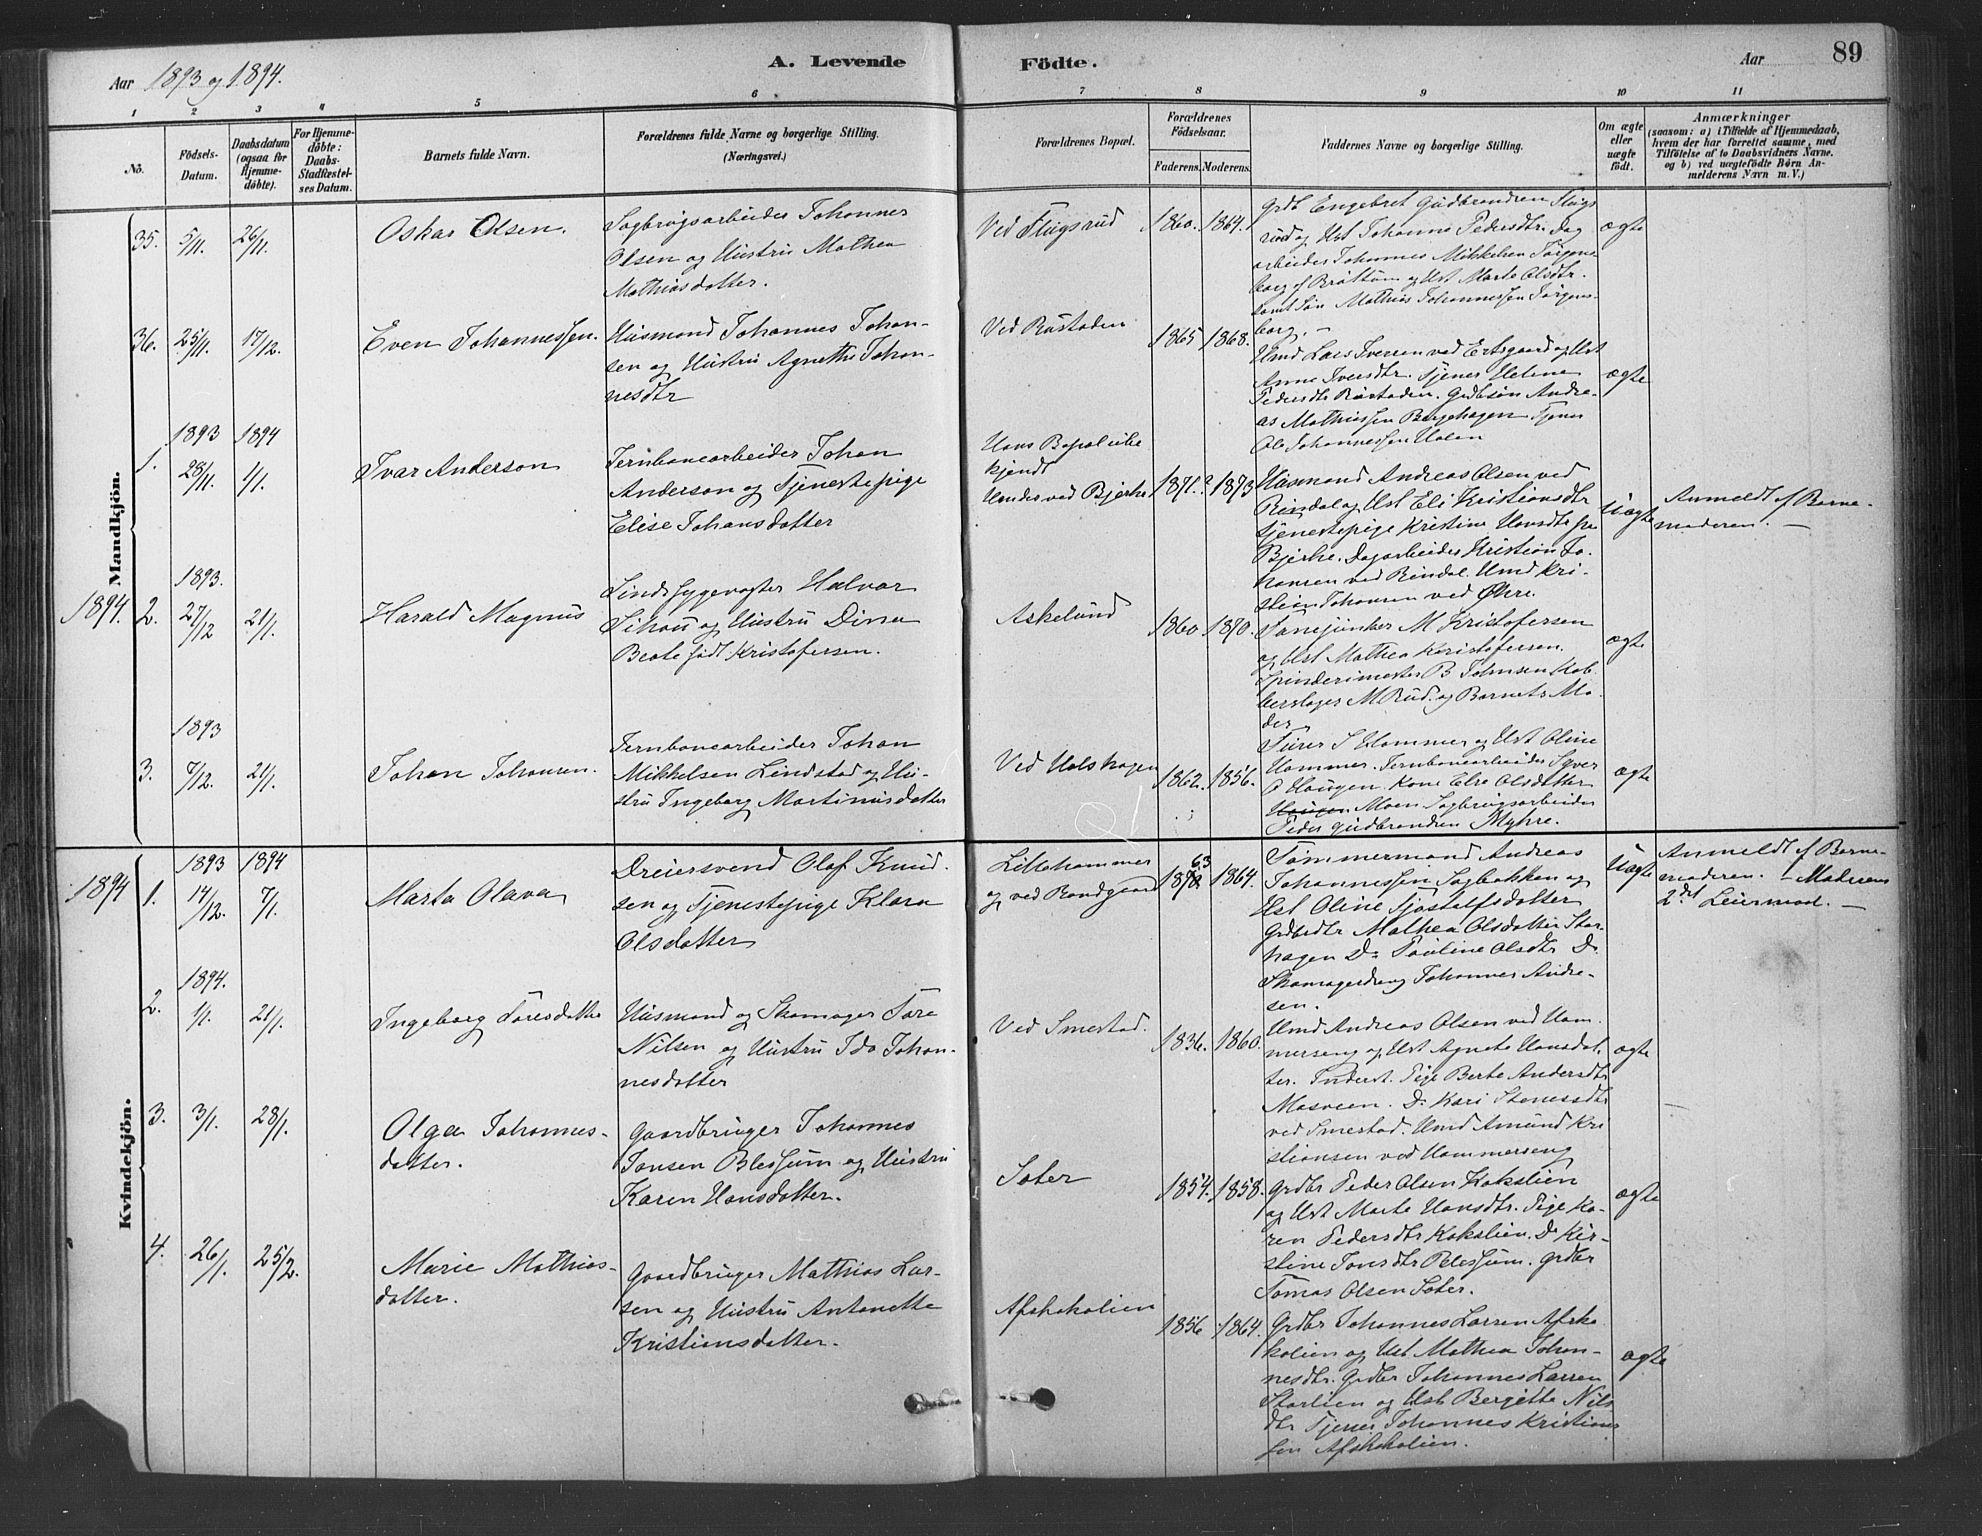 SAH, Fåberg prestekontor, Ministerialbok nr. 9, 1879-1898, s. 89